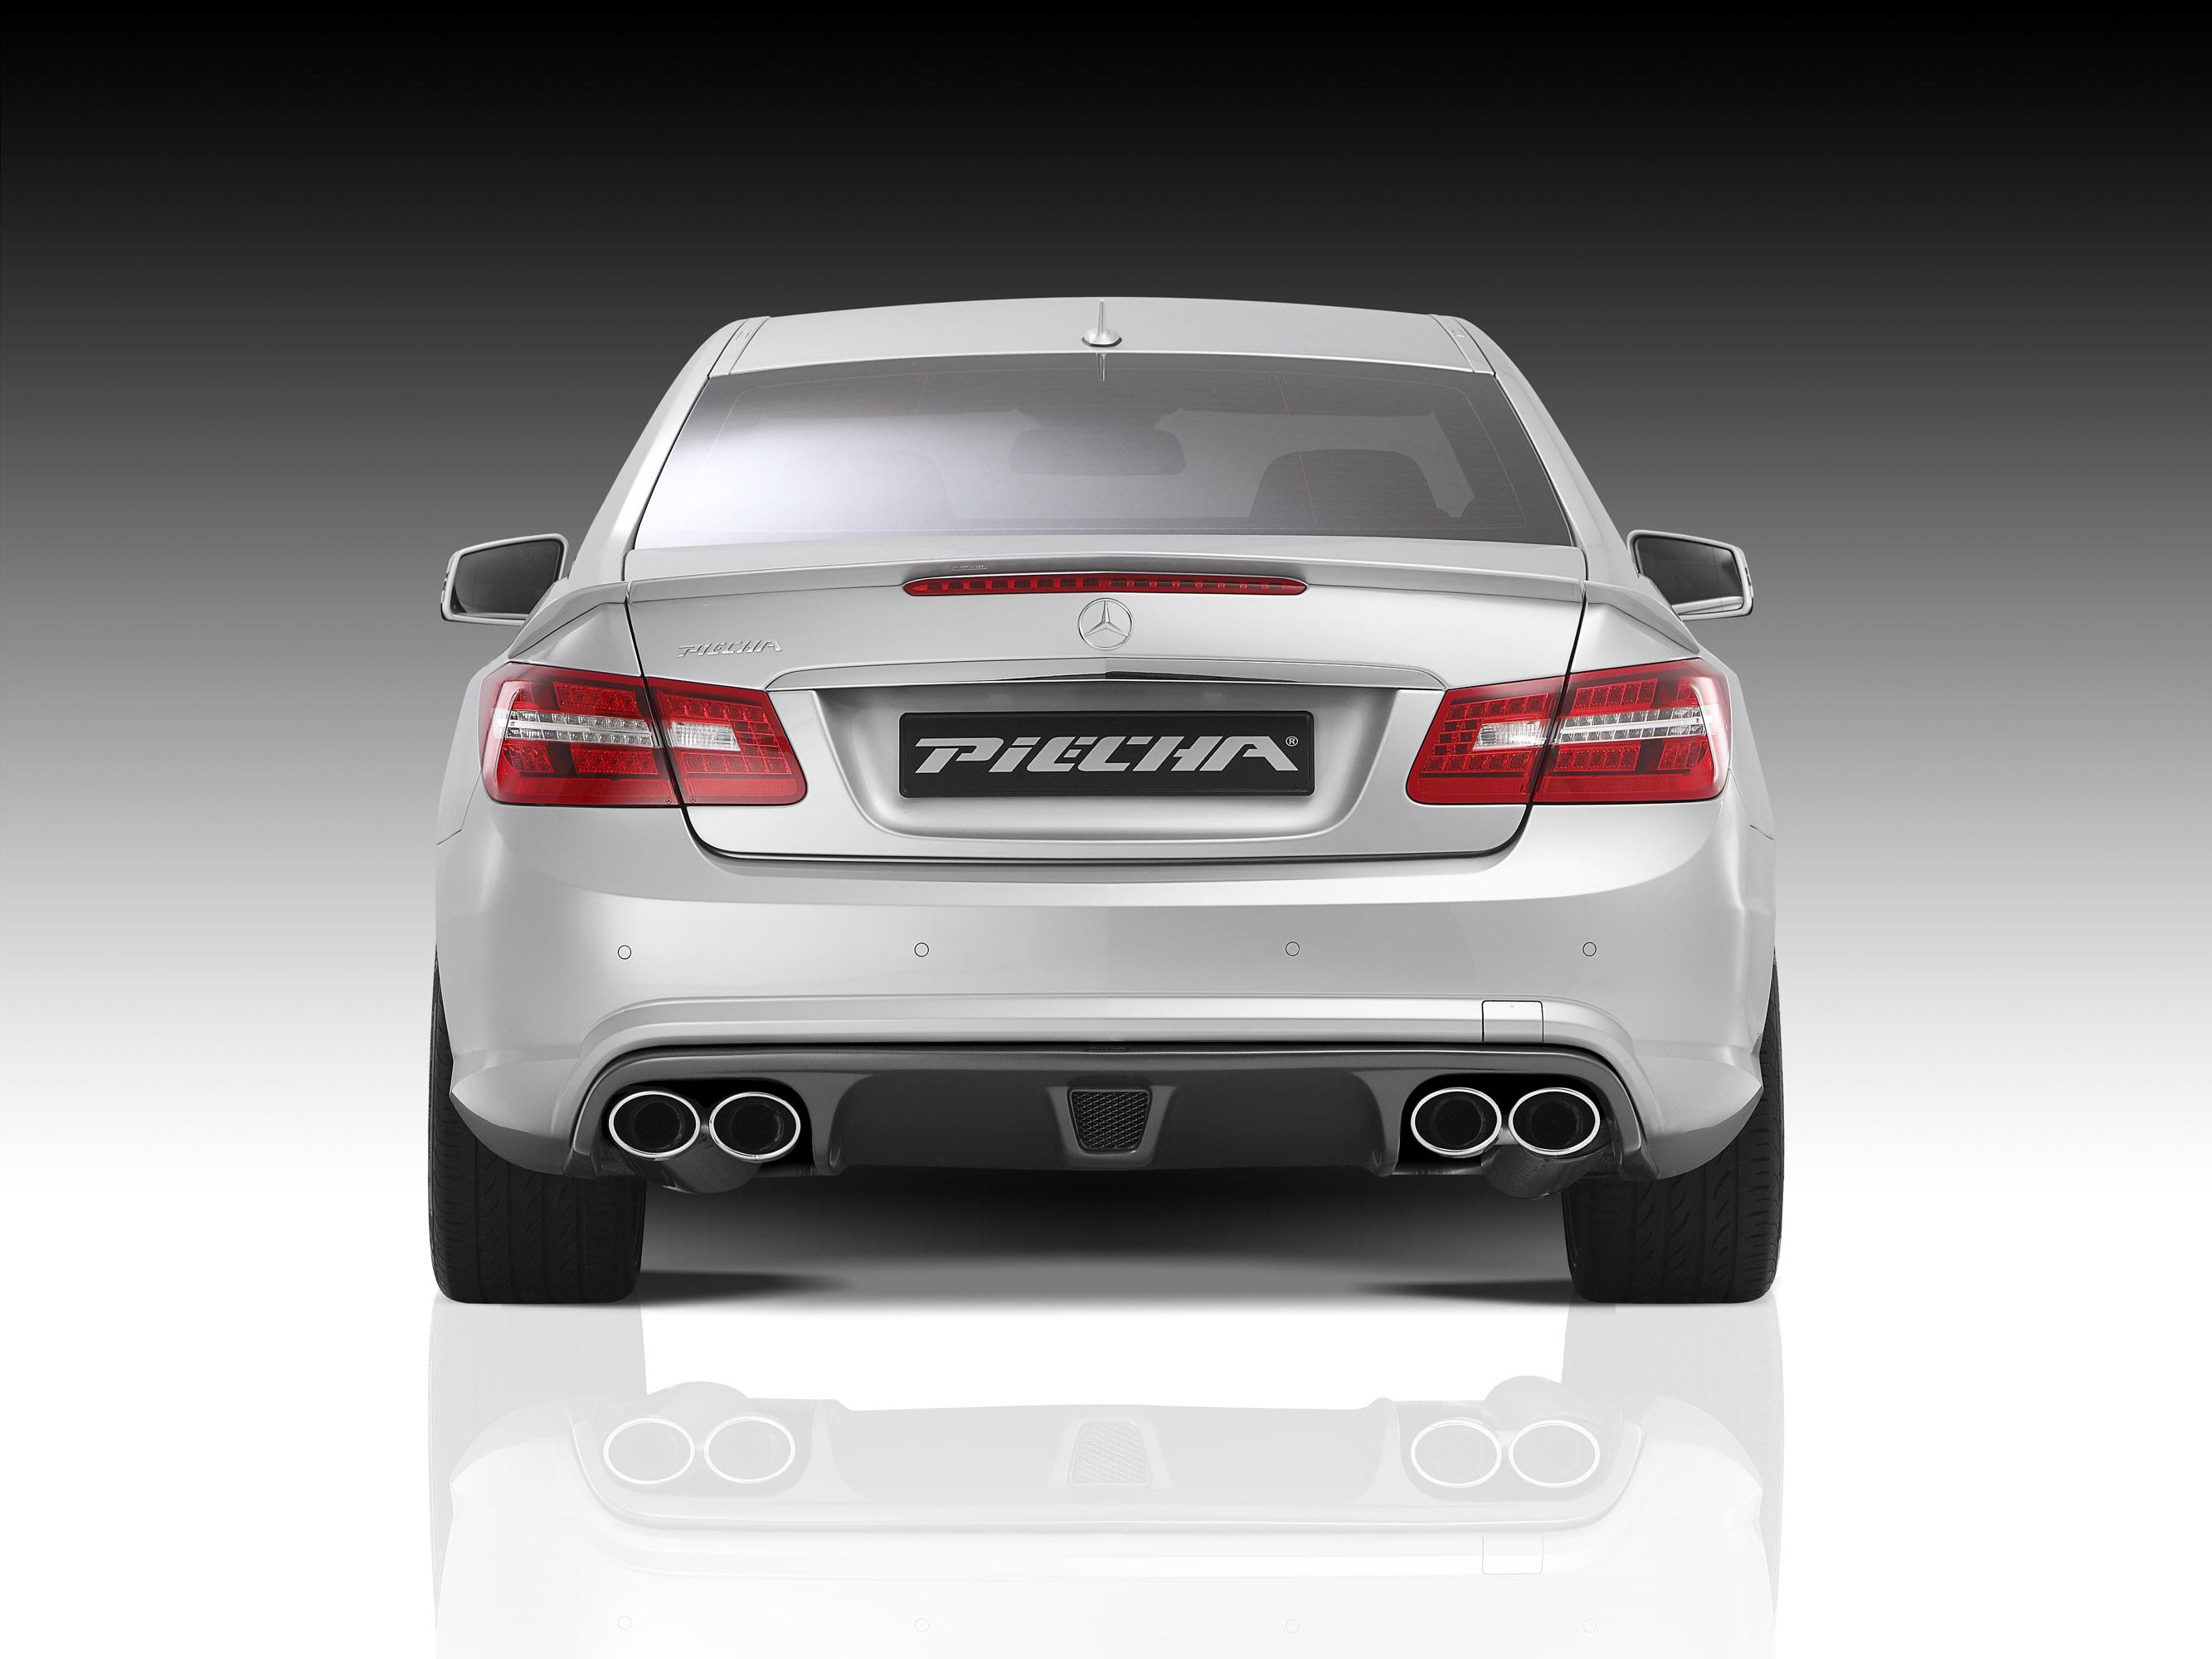 PIECHA Design releases tuning kit for MercedesBenz EClass